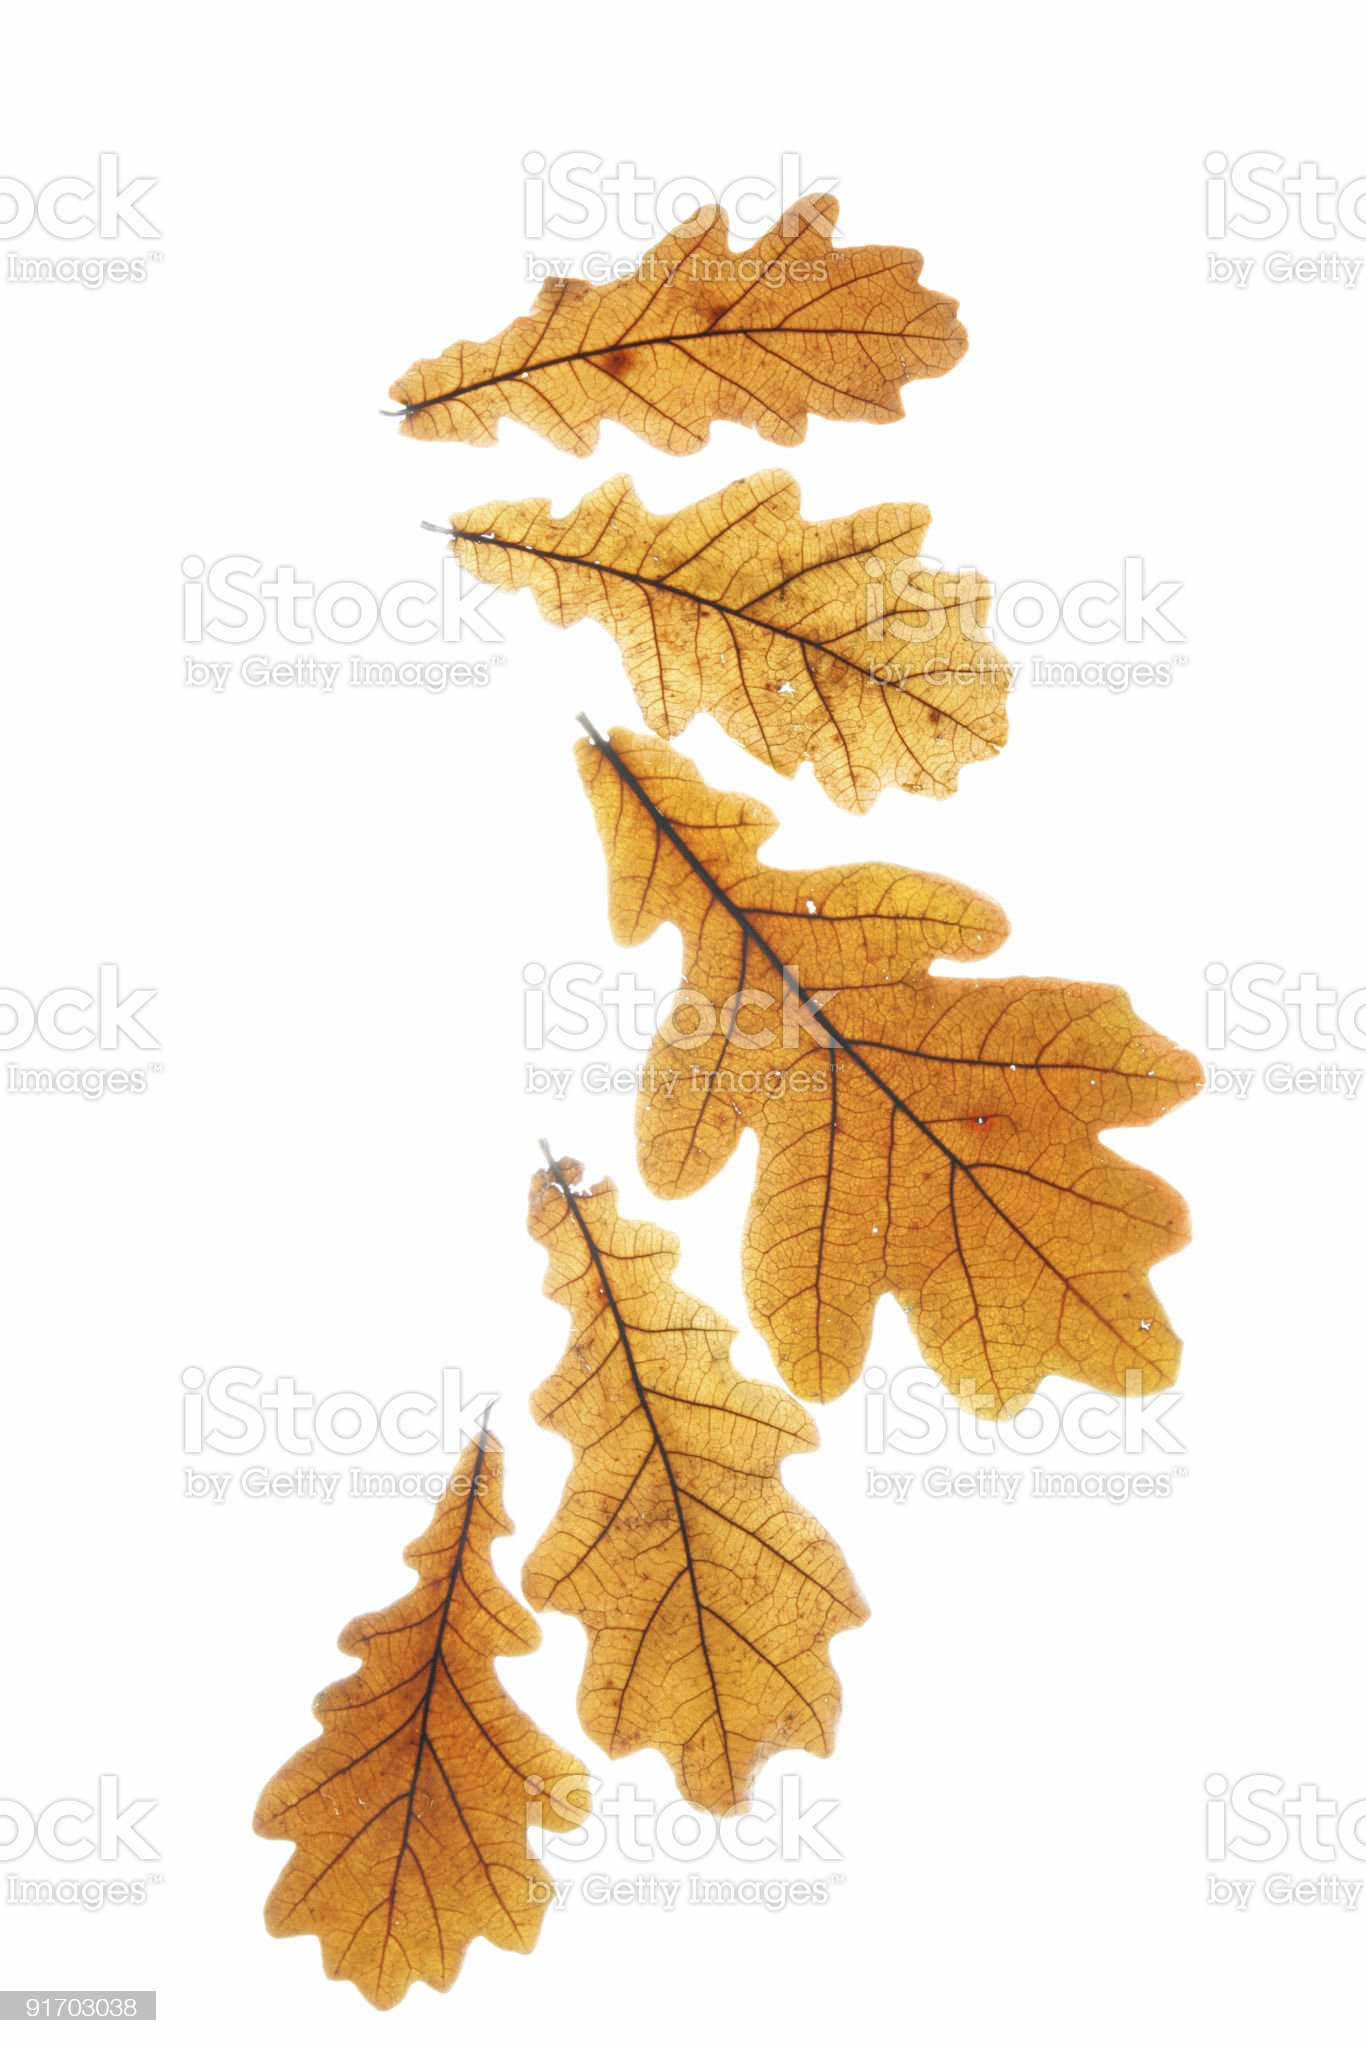 Dry oak leaves royalty-free stock photo